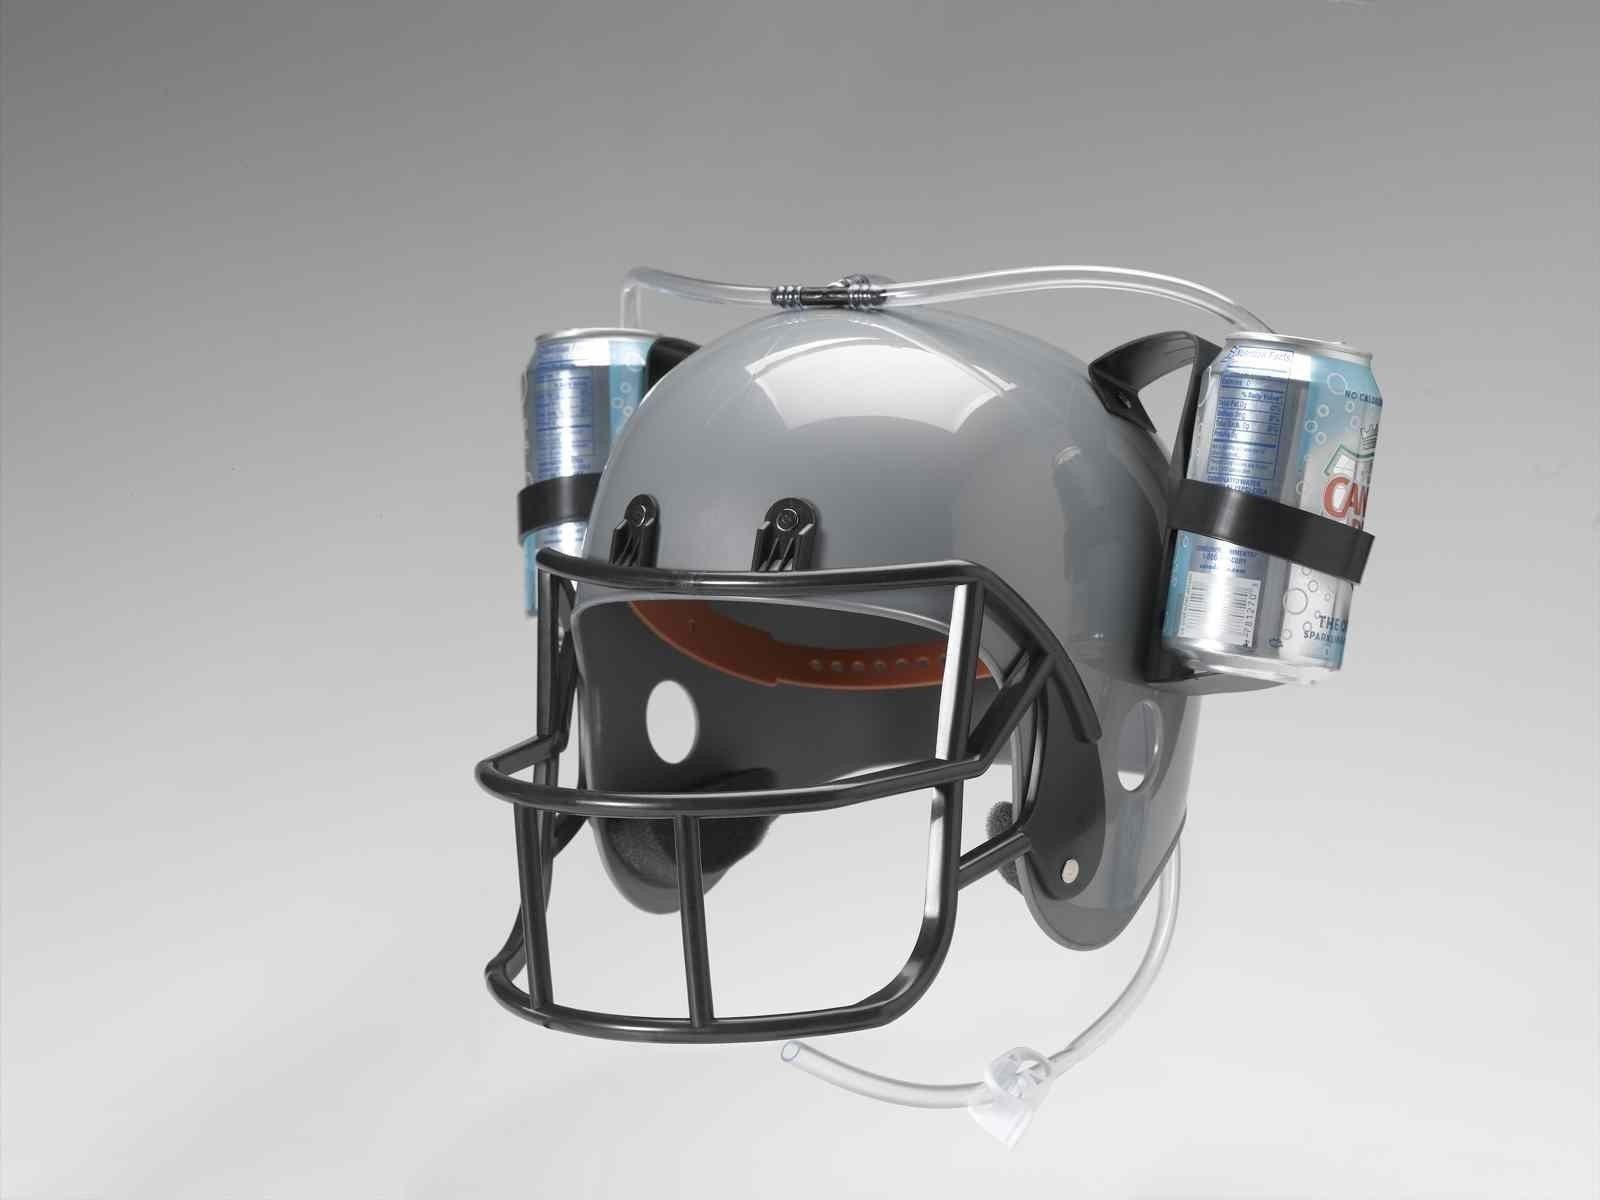 Football Drinking Helmet - Silver Novelty Item by Forum Novelties (Image #2)